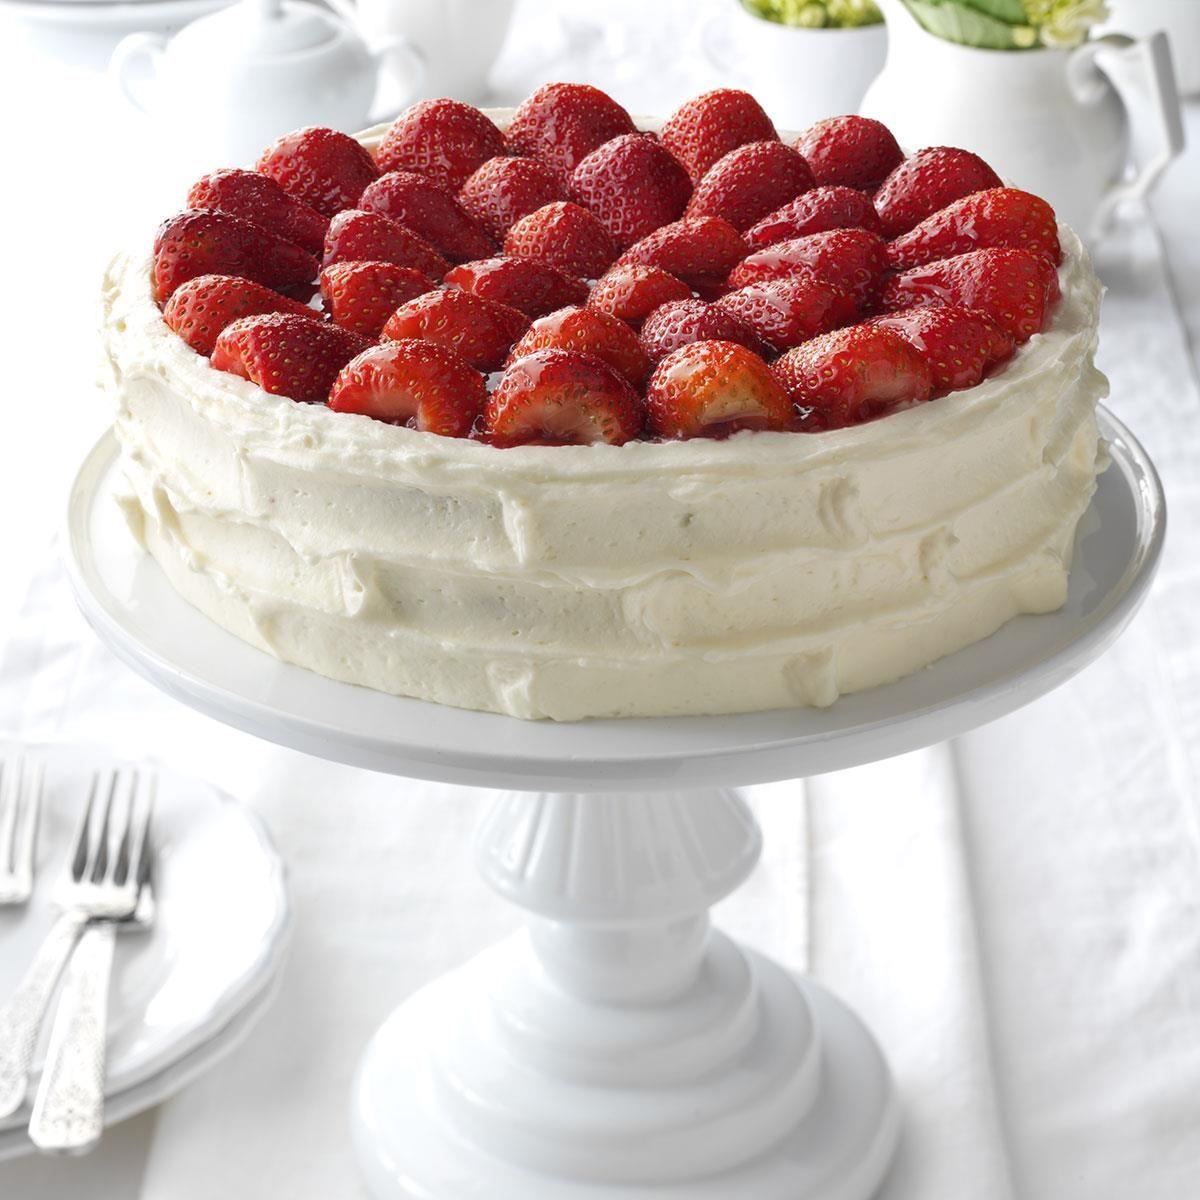 34 Easy Cake Decorating Ideas | Taste of Home